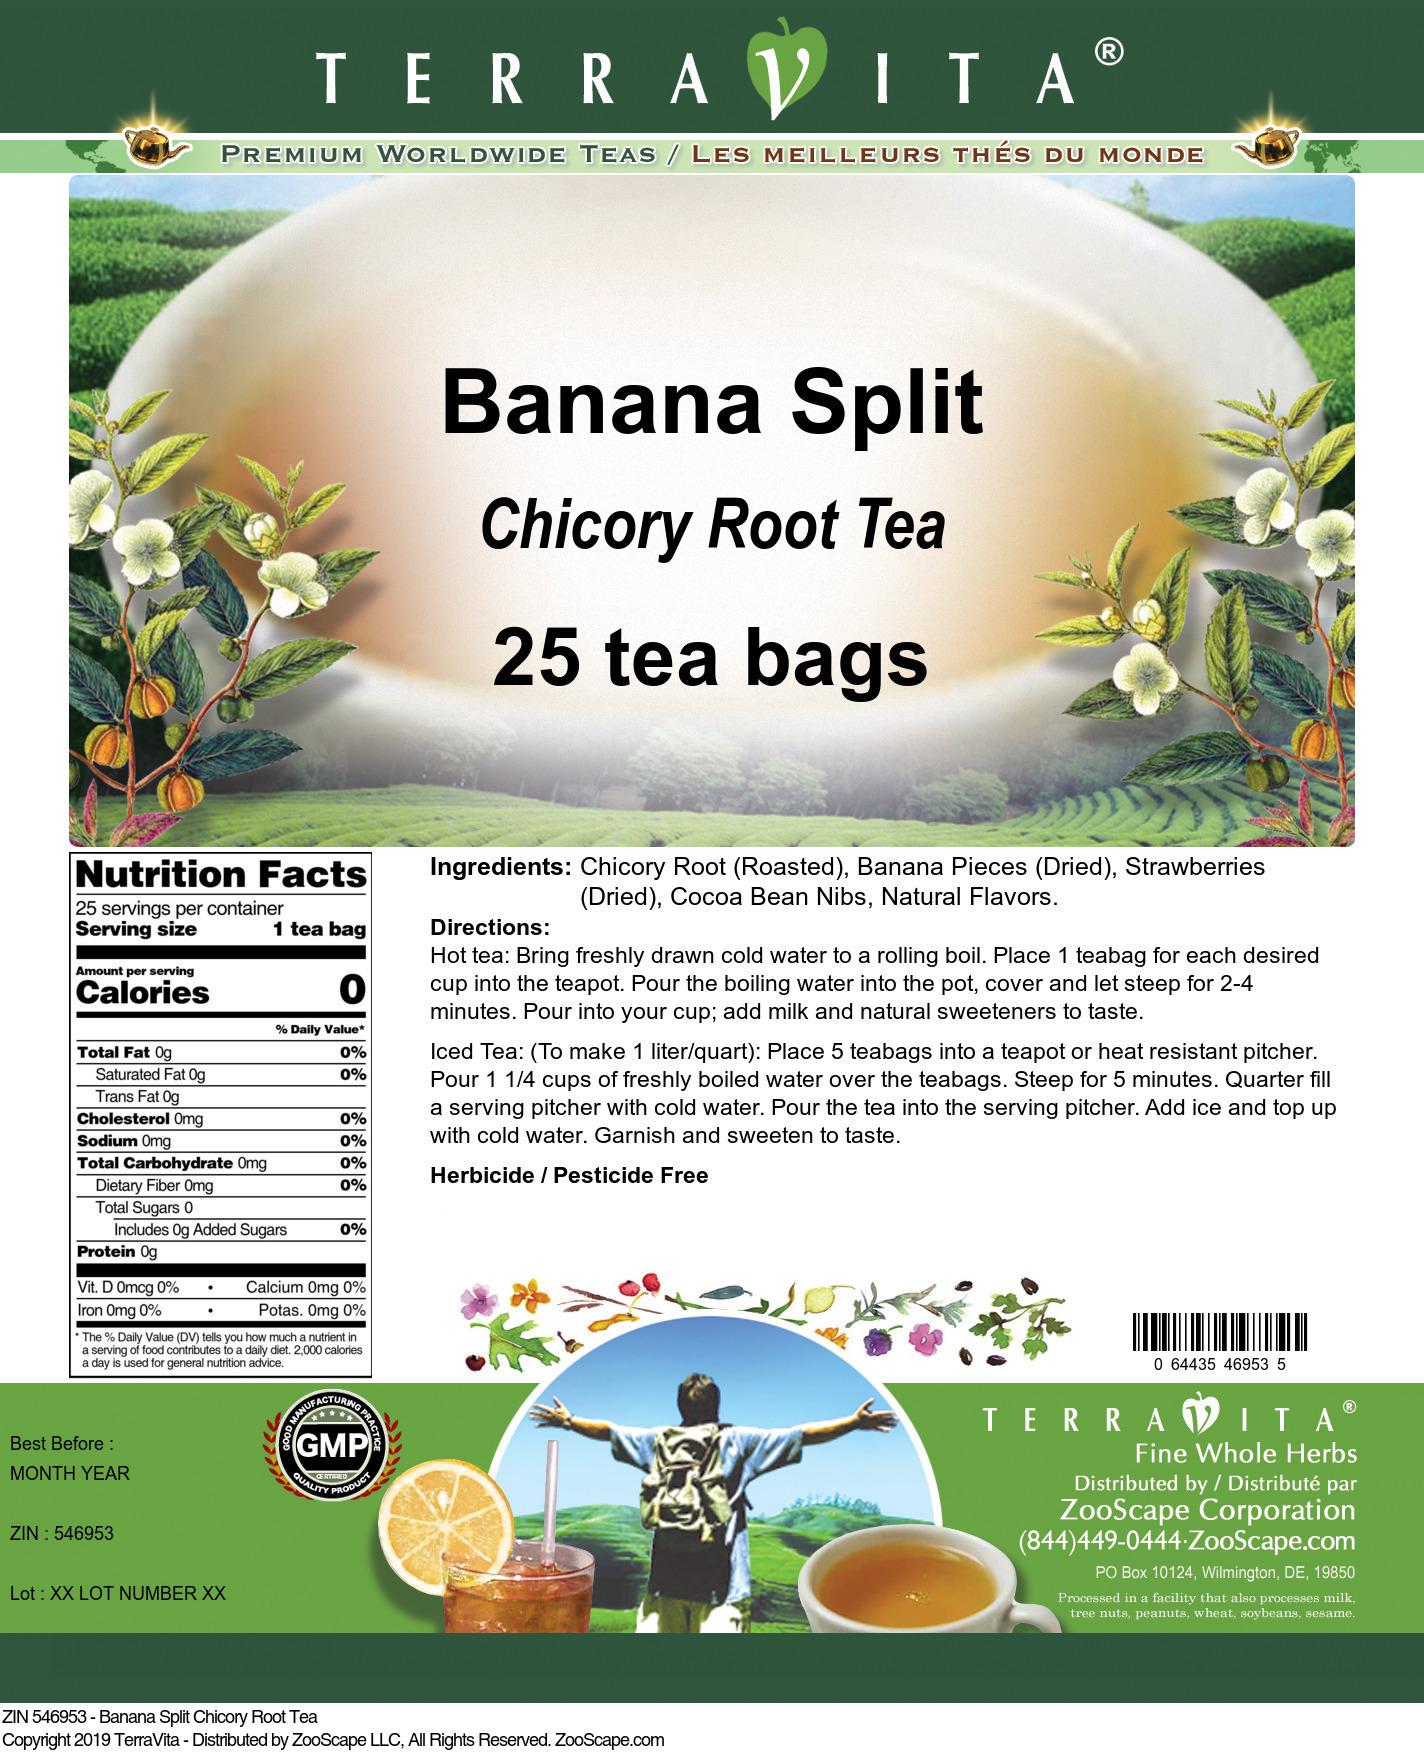 Banana Split Chicory Root Tea